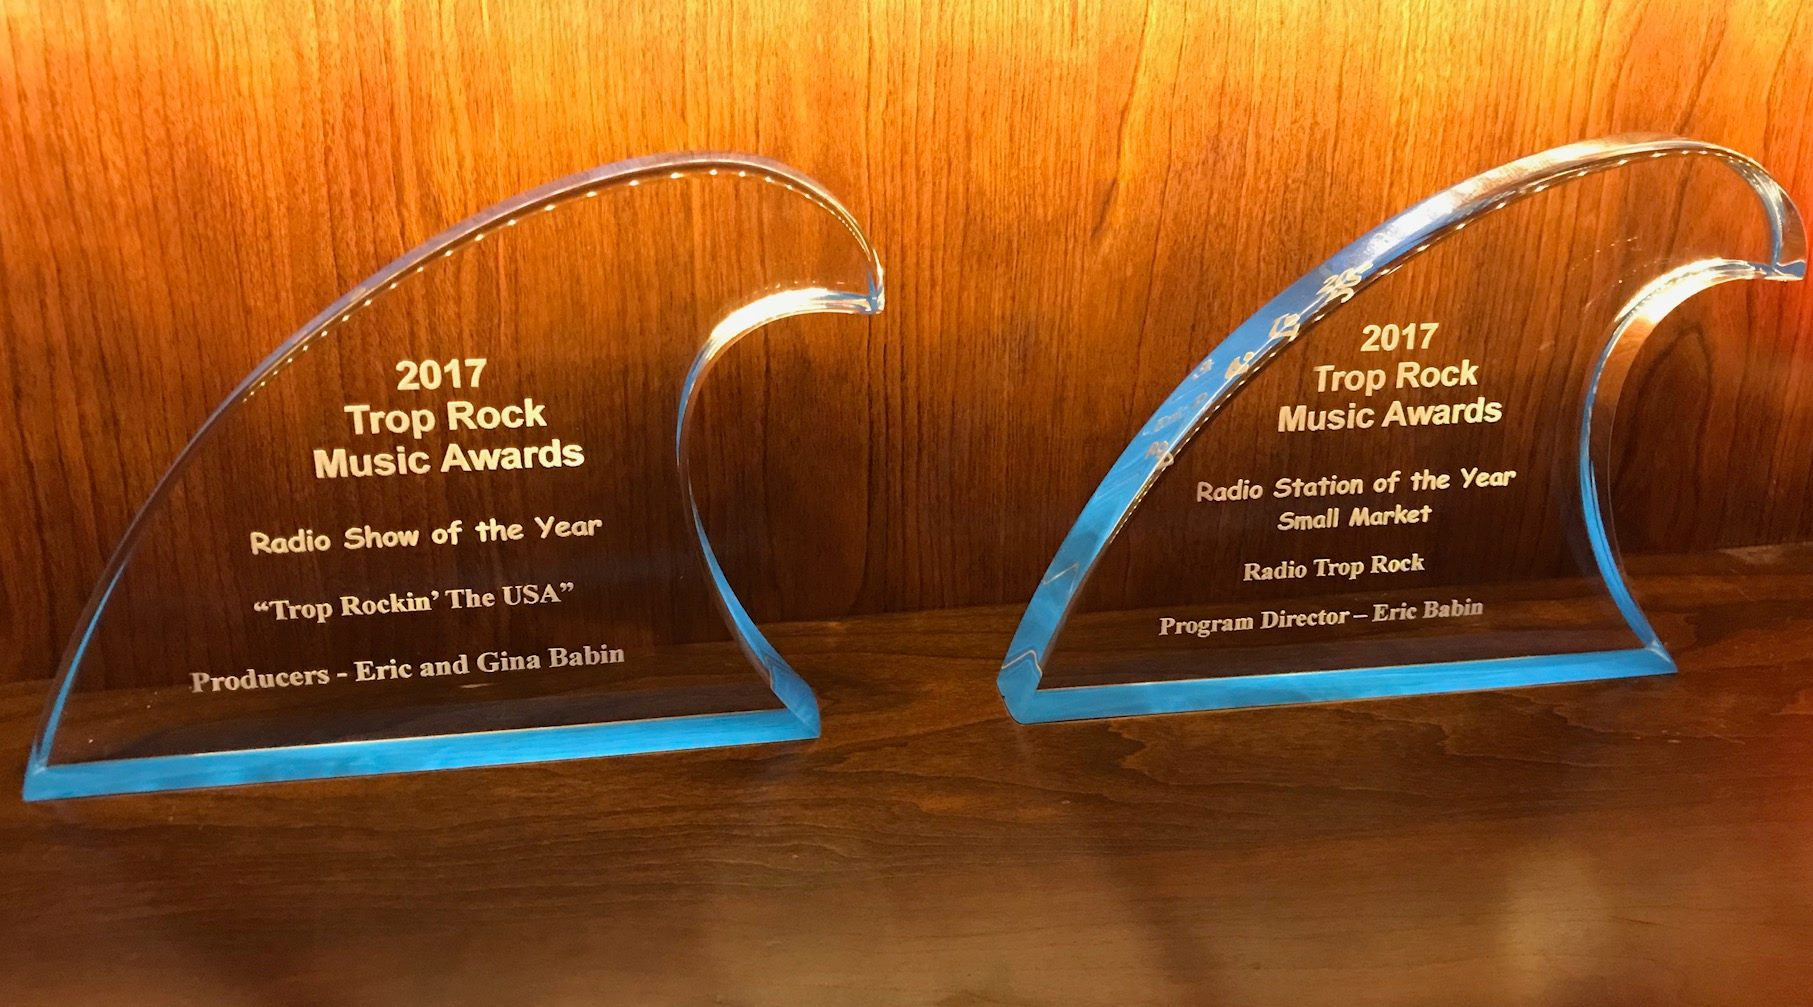 TRMA Award - RadioTropRock